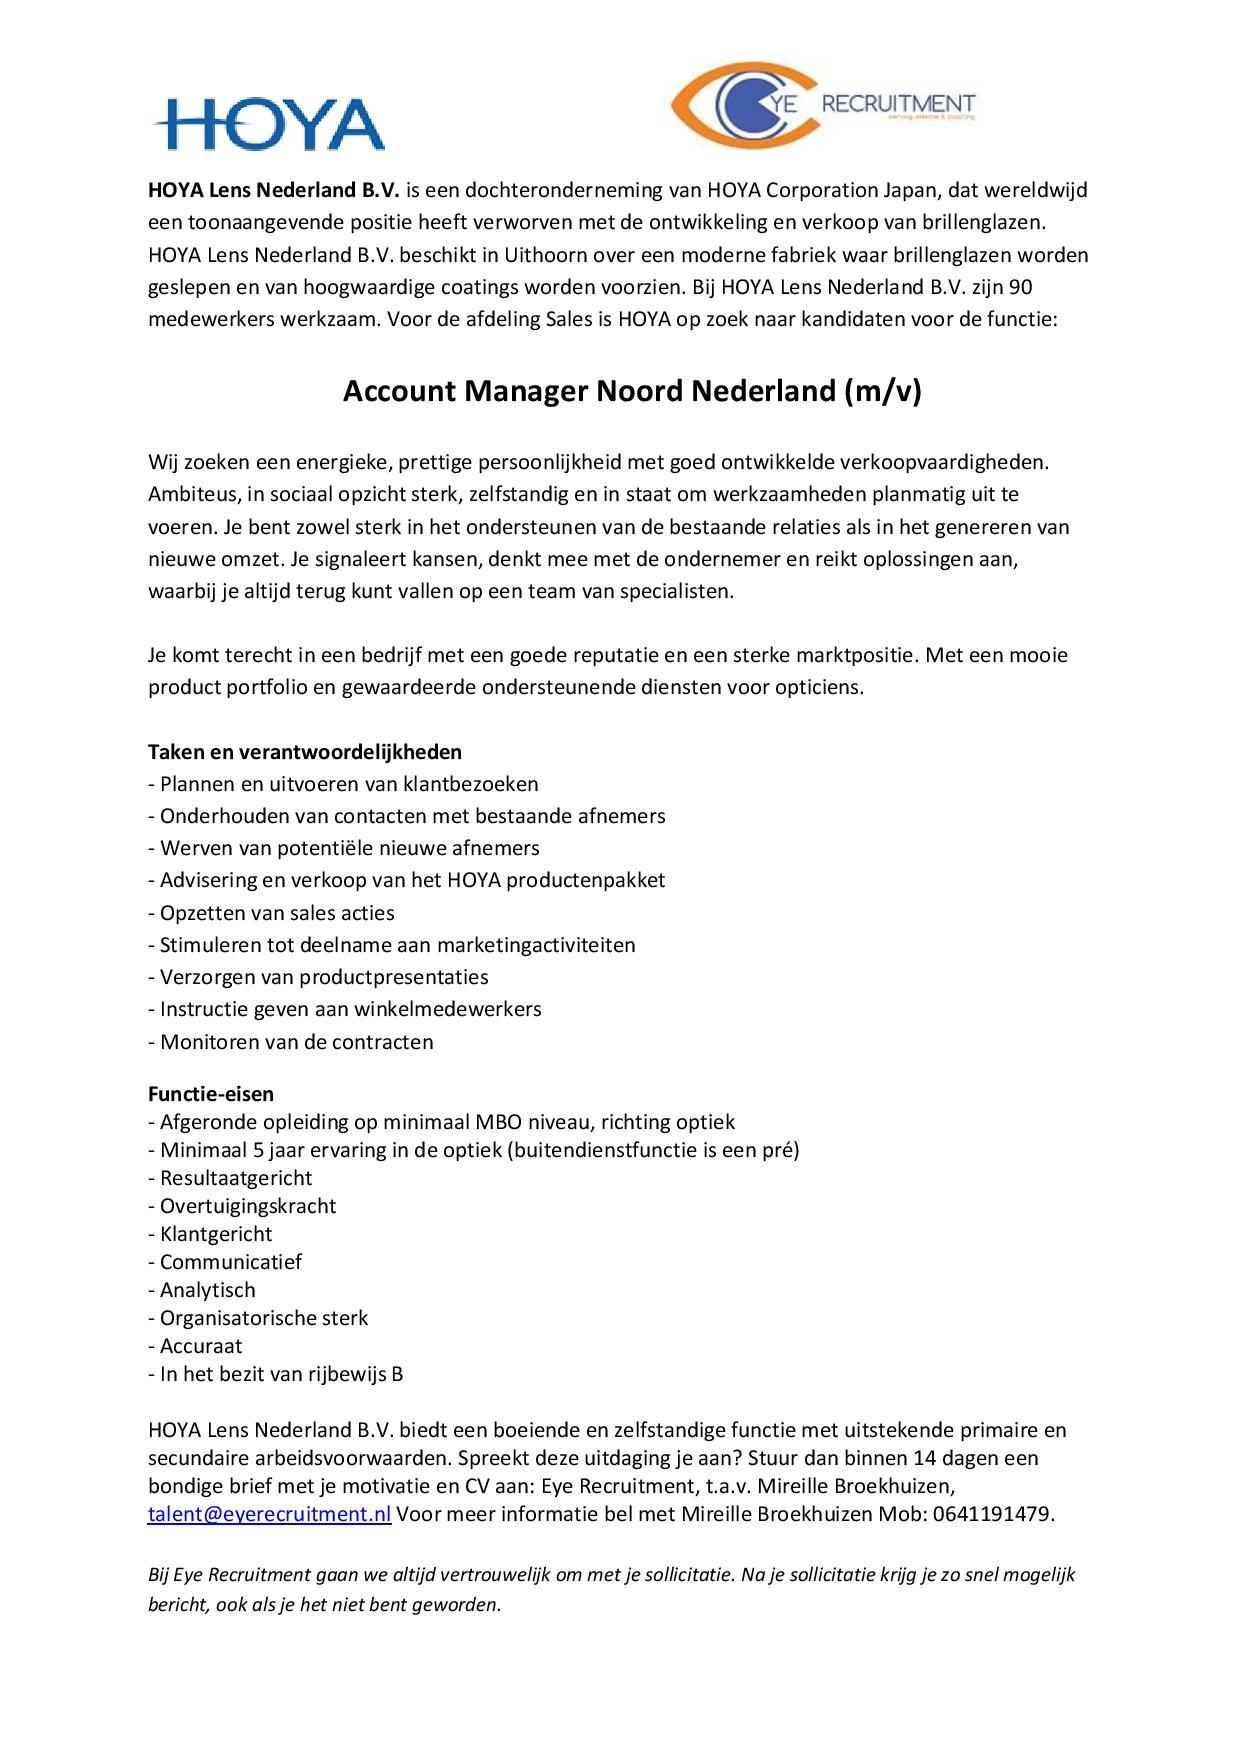 Hoya vacature Account Manager regio Noord-page-001